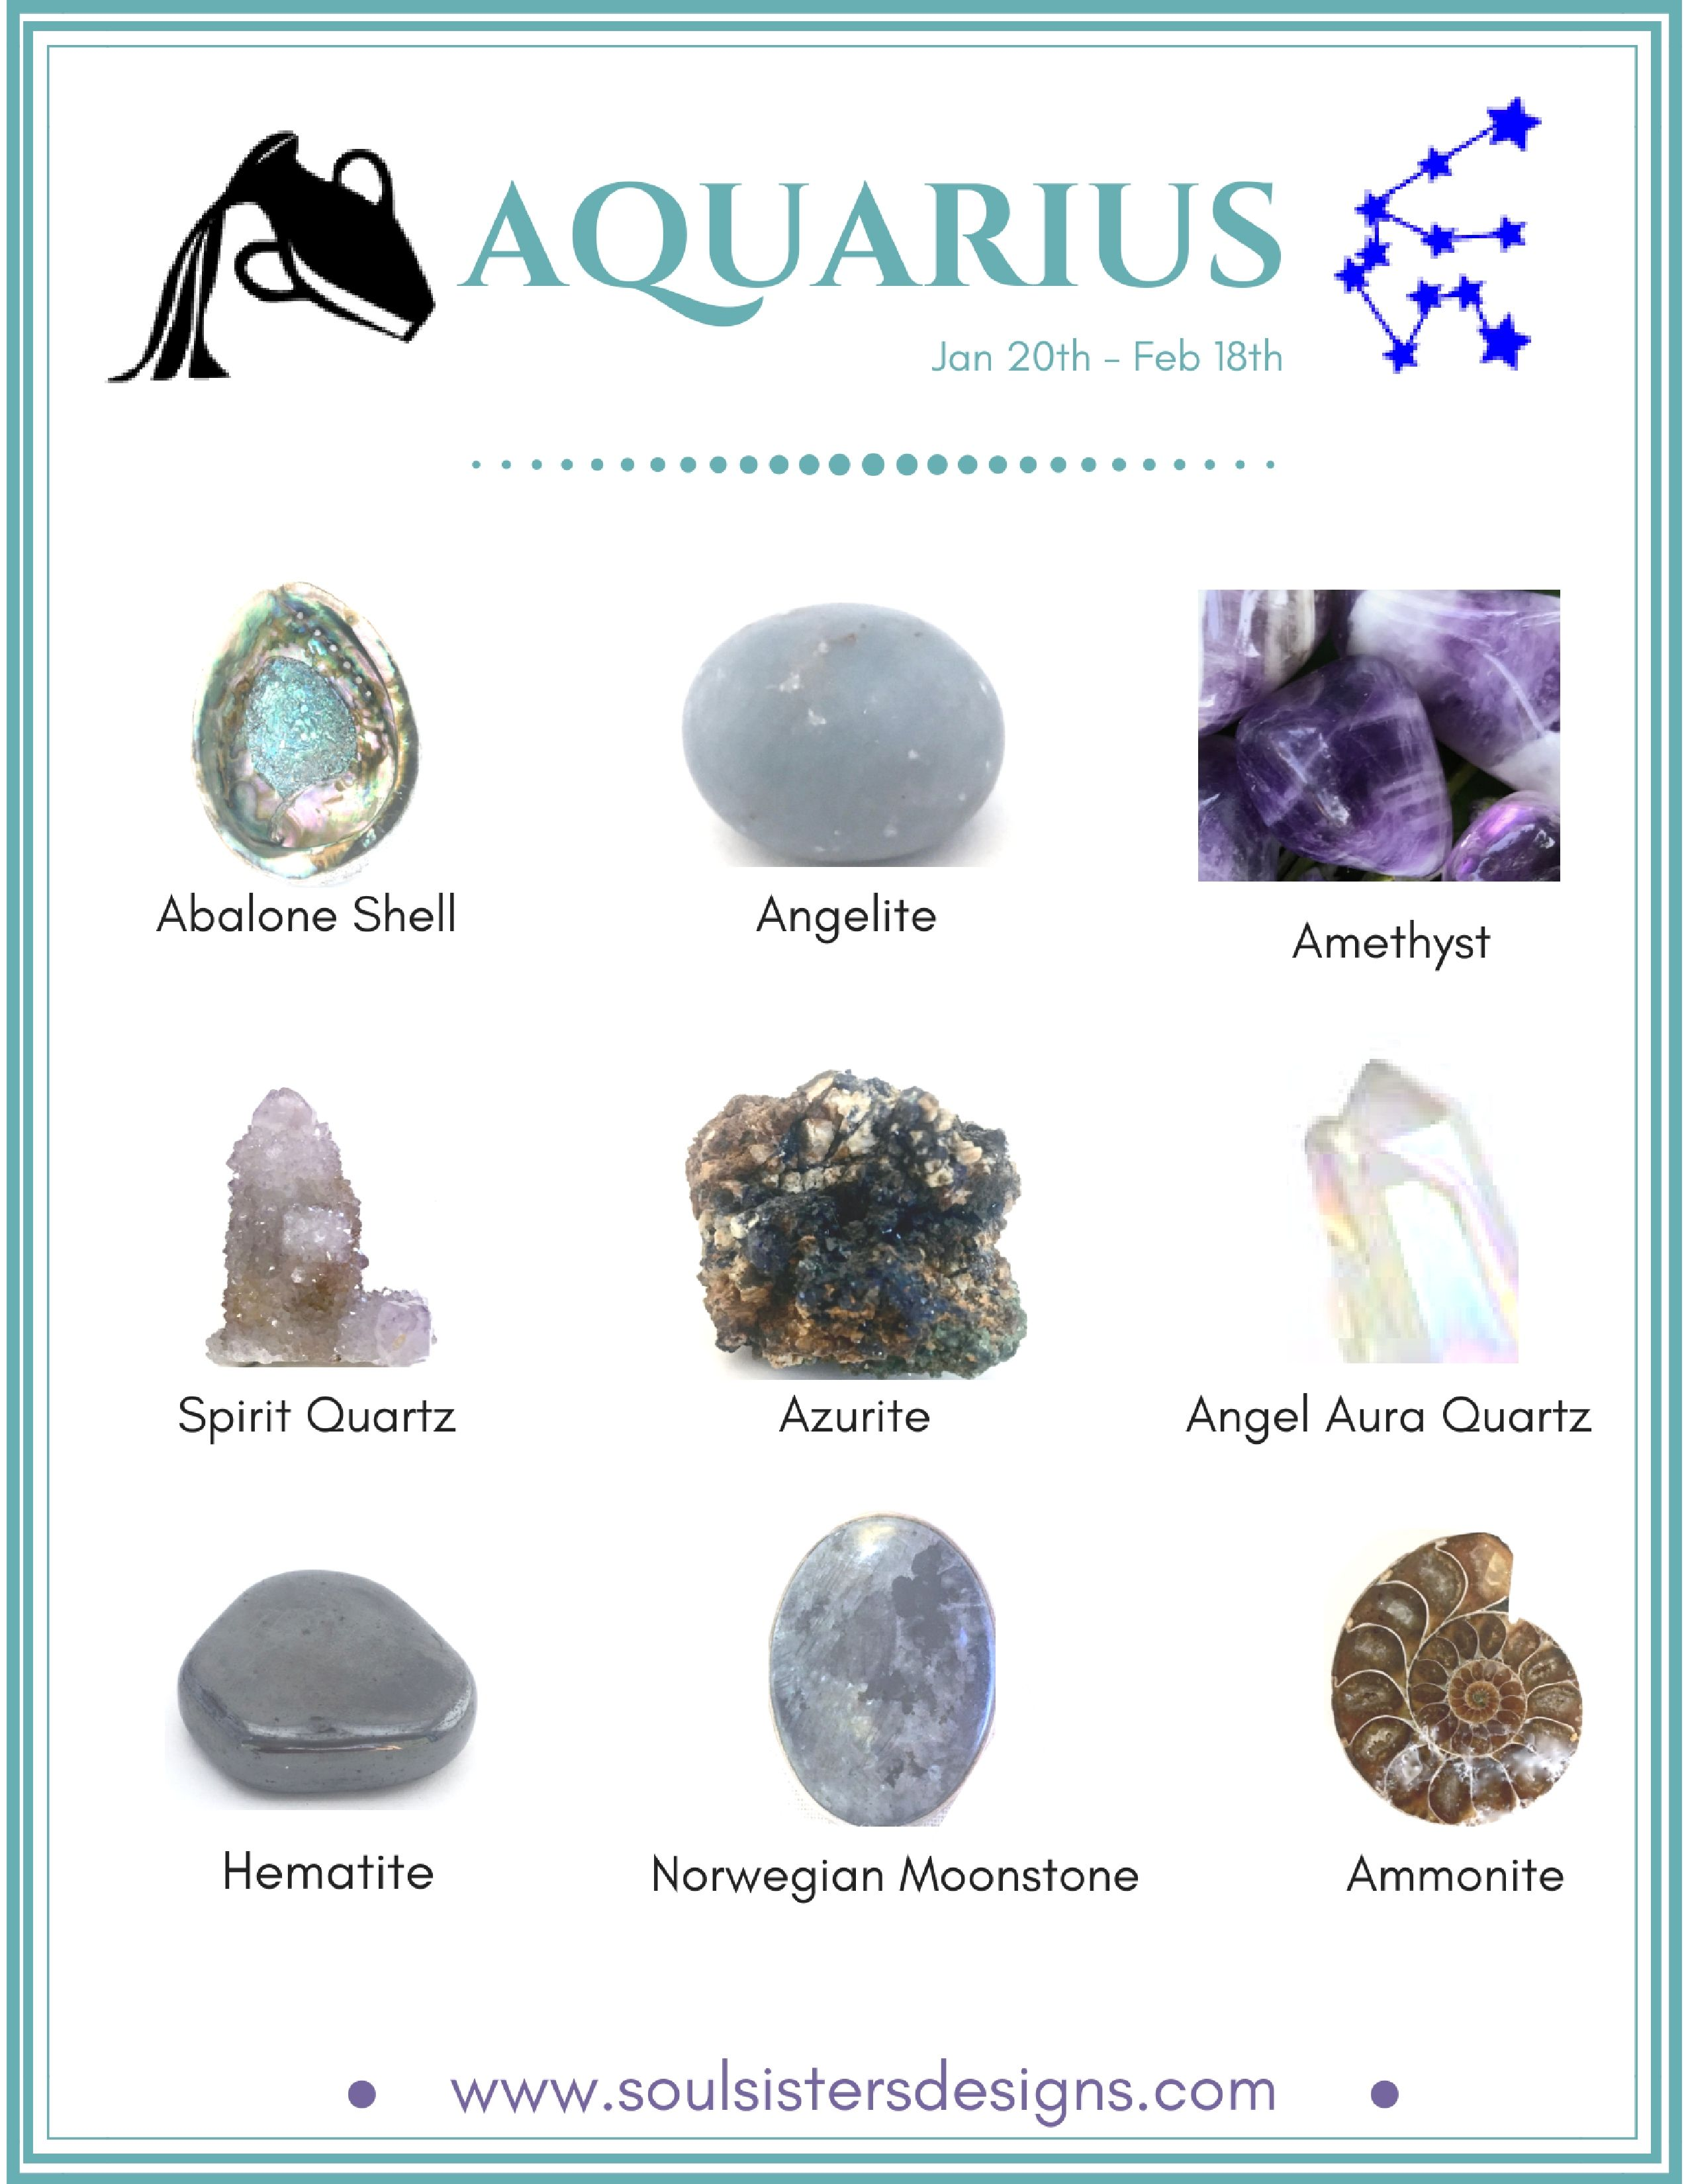 Aquarius Healing Crystals by Soul Sisters Designs